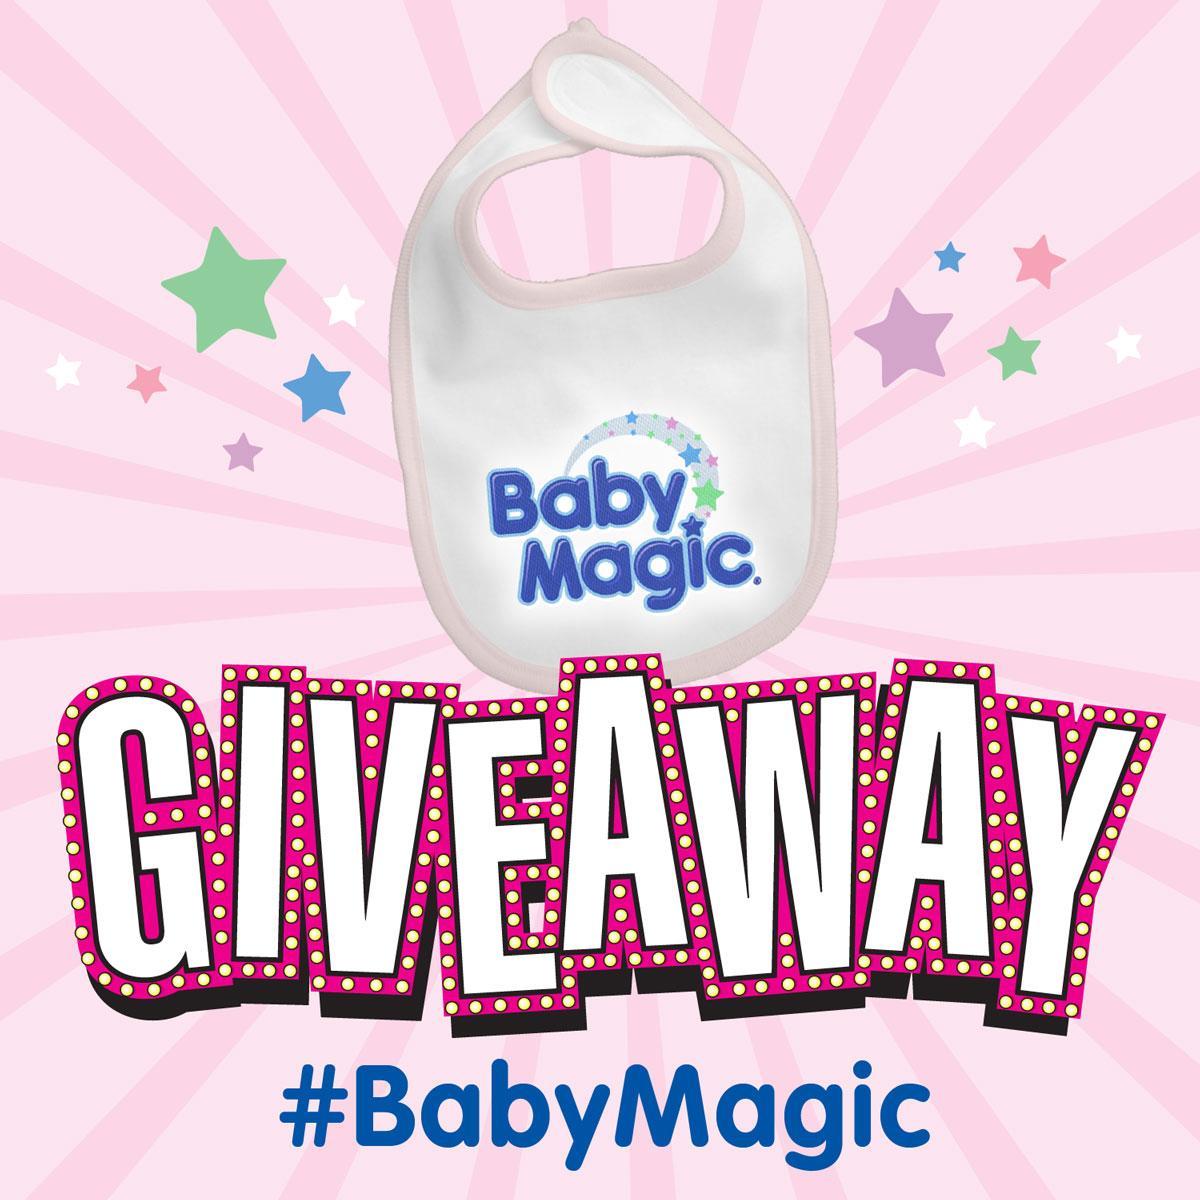 Retweet this for a chance to win a Baby Magic bib! #BabyMagic We'll announce the winner tomorrow. http://t.co/2xxRK1tSFu